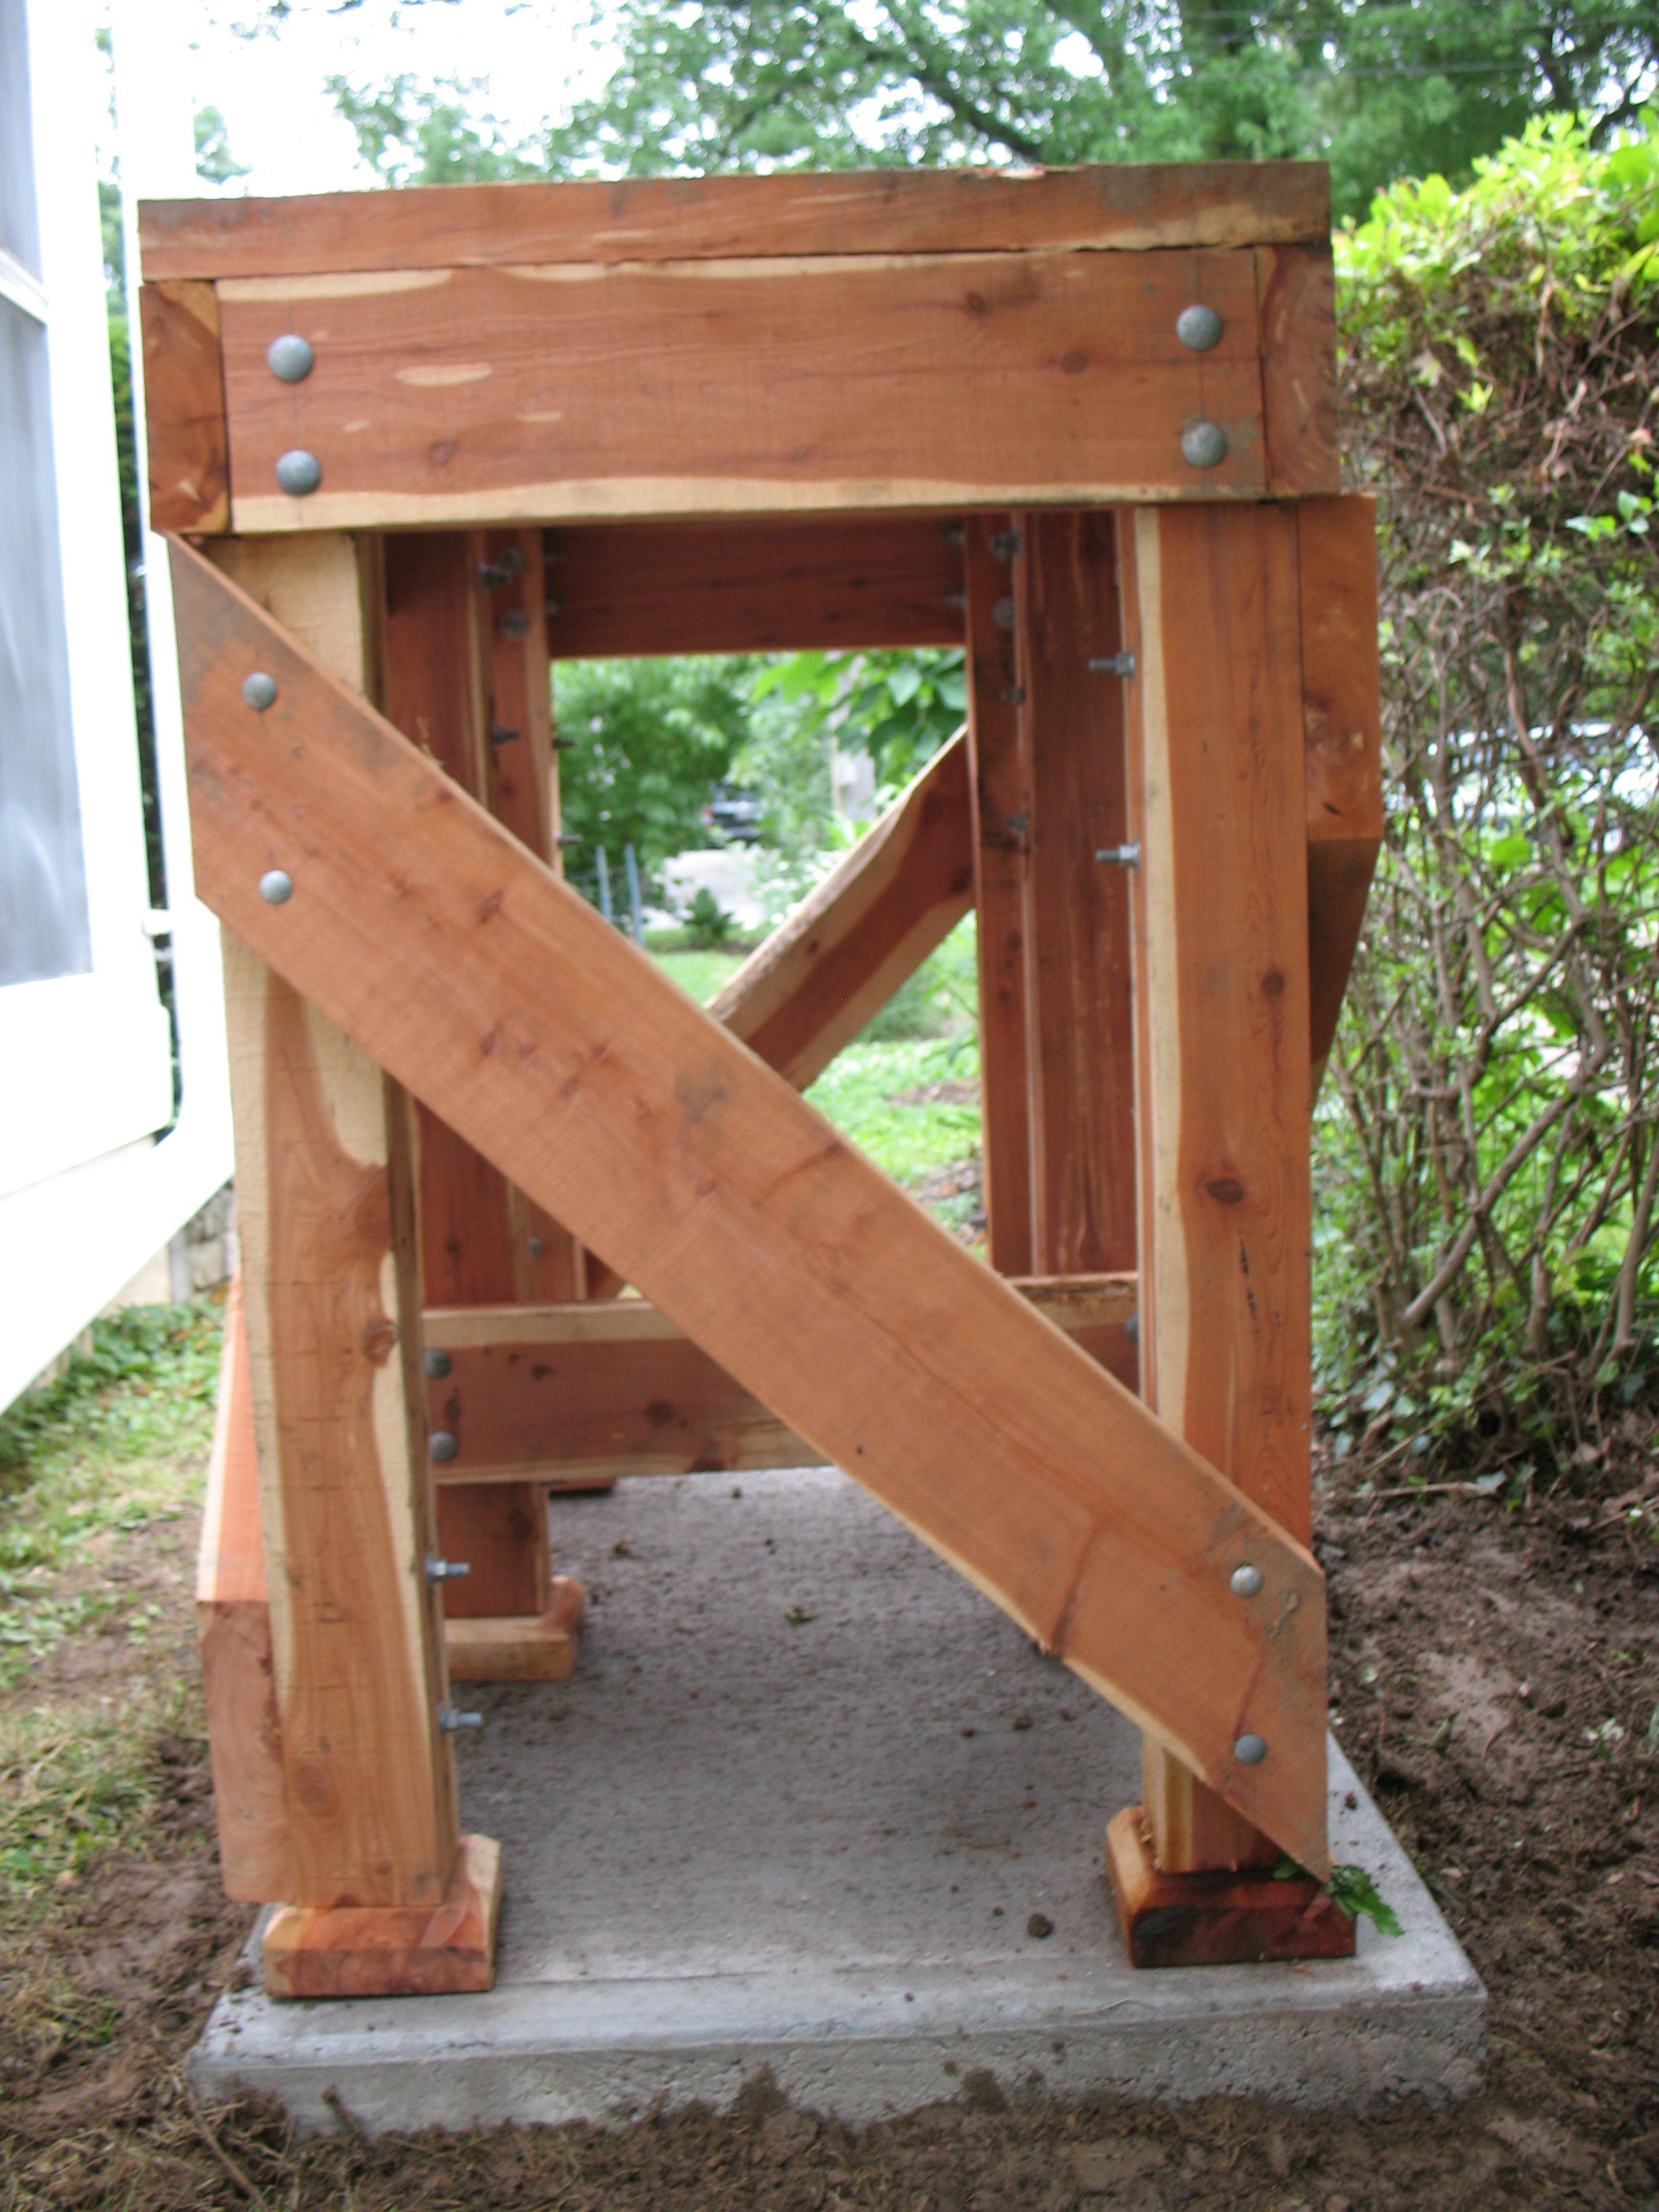 Fullsize Of Rain Barrel Stand